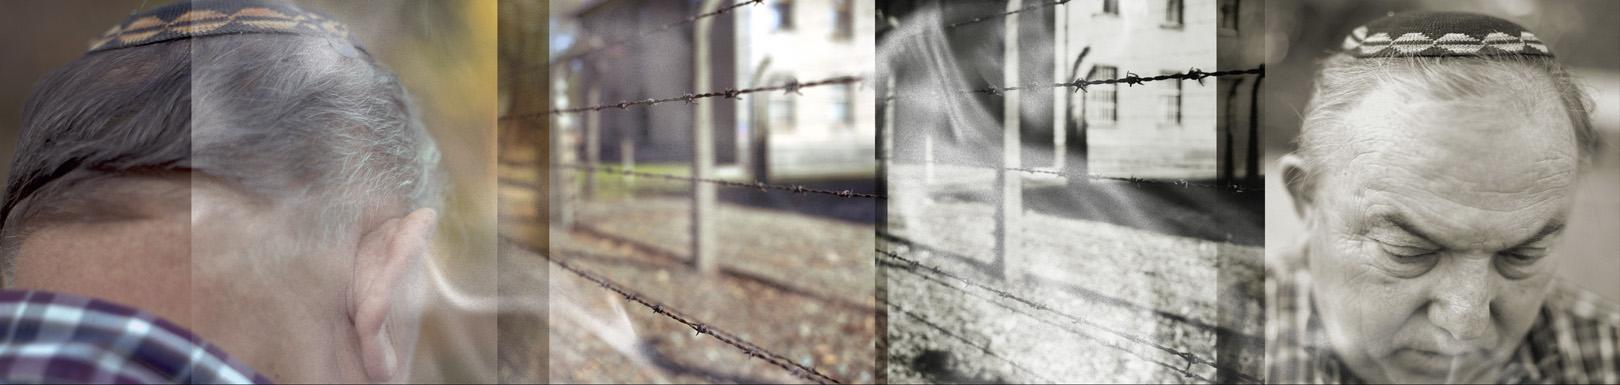 Remembering Poland 4.jpg